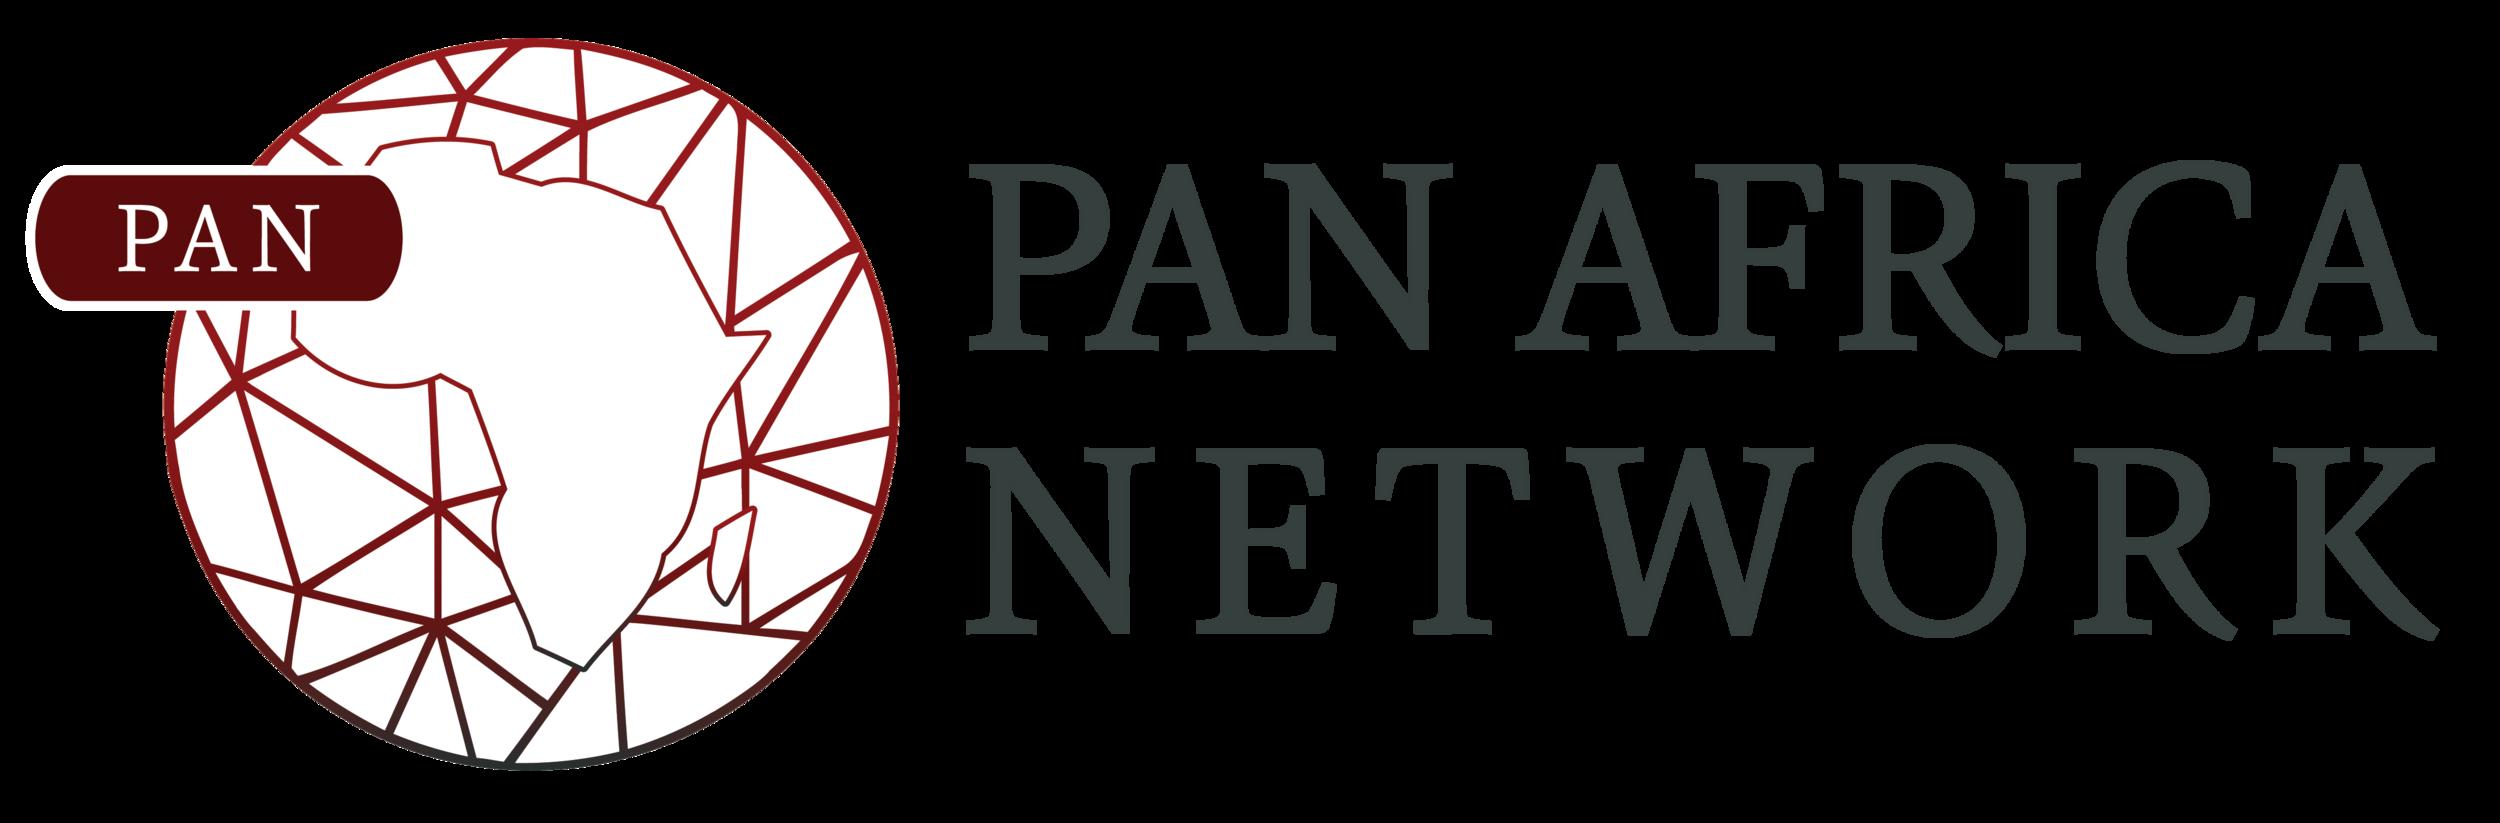 PAN AFRICA NETWORK LOGO 2-02.png